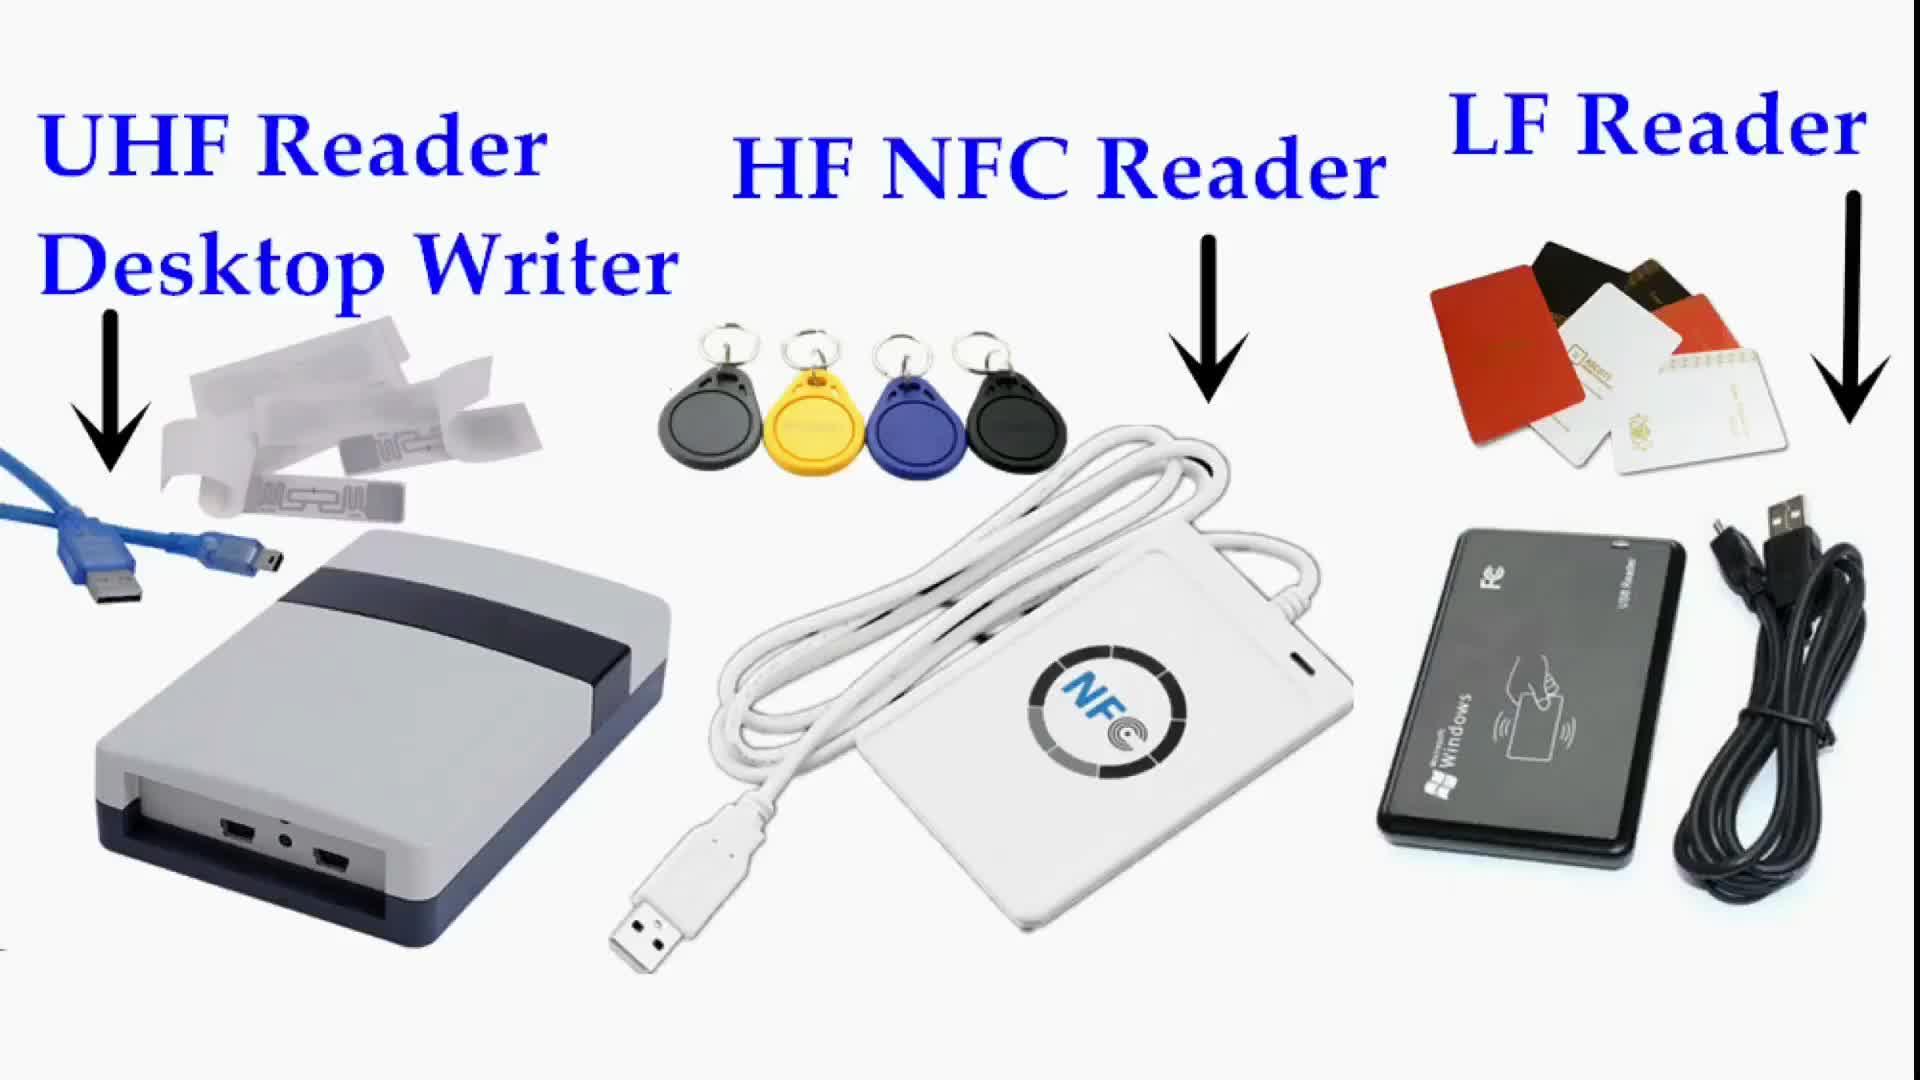 Cheap handheld rfid reader uhf rfid parking reader Impinj R2000 chip